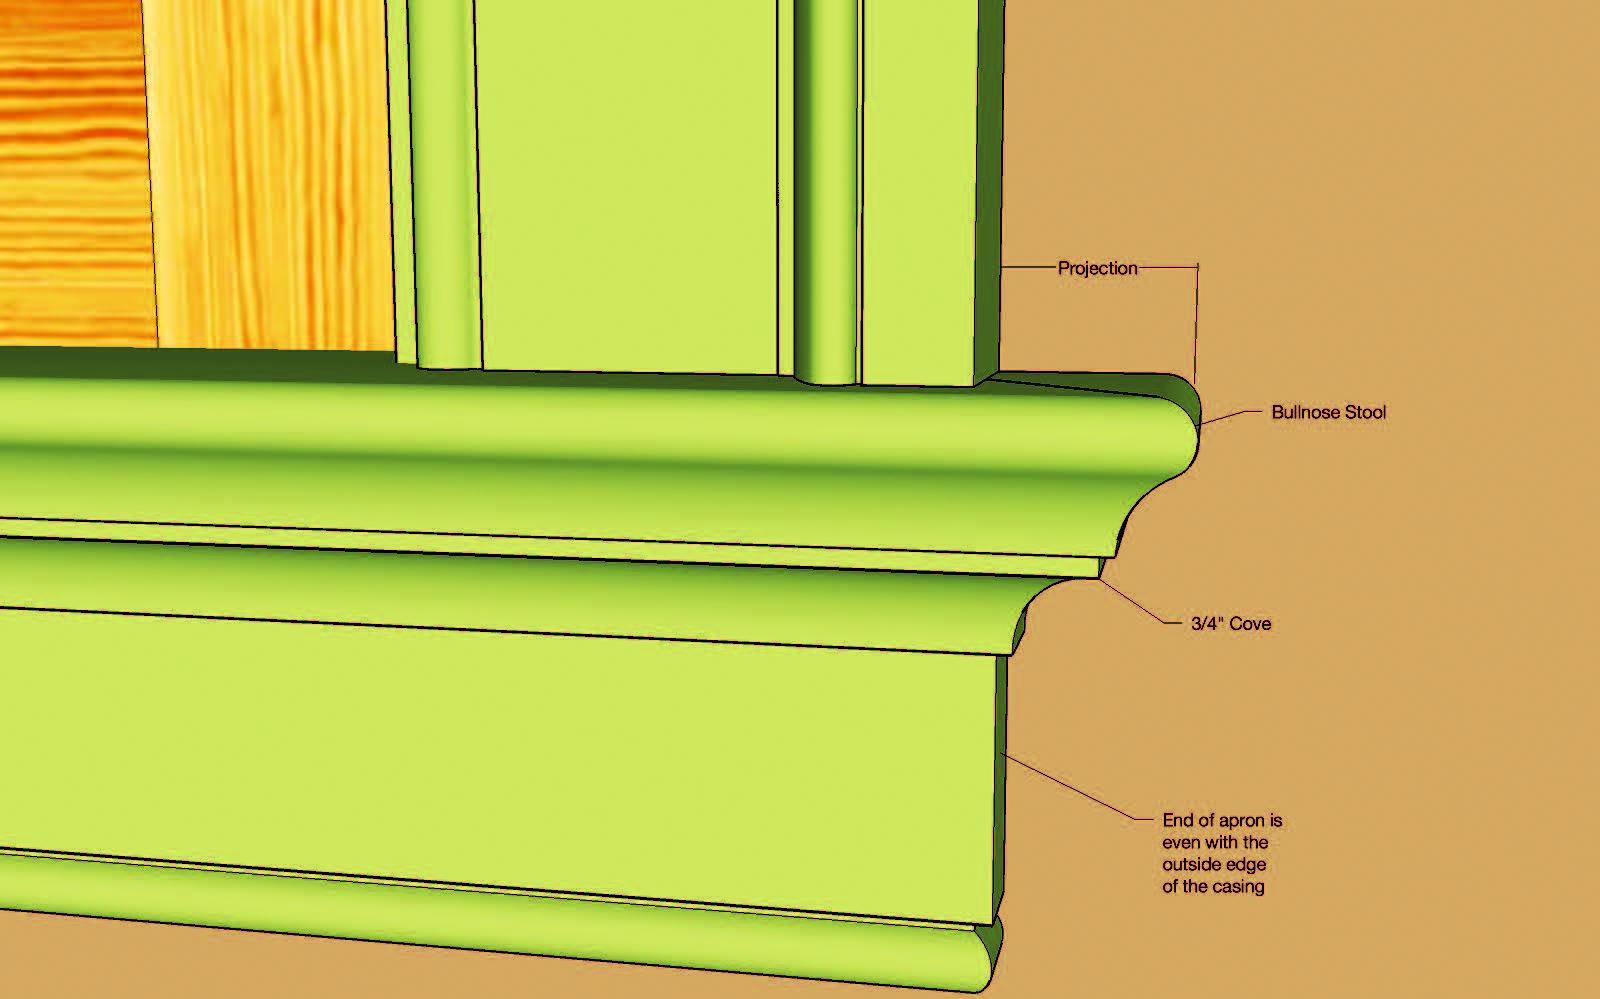 Diy interior window trim - Window Stool Cap And Apron Are Used On This Window Trim